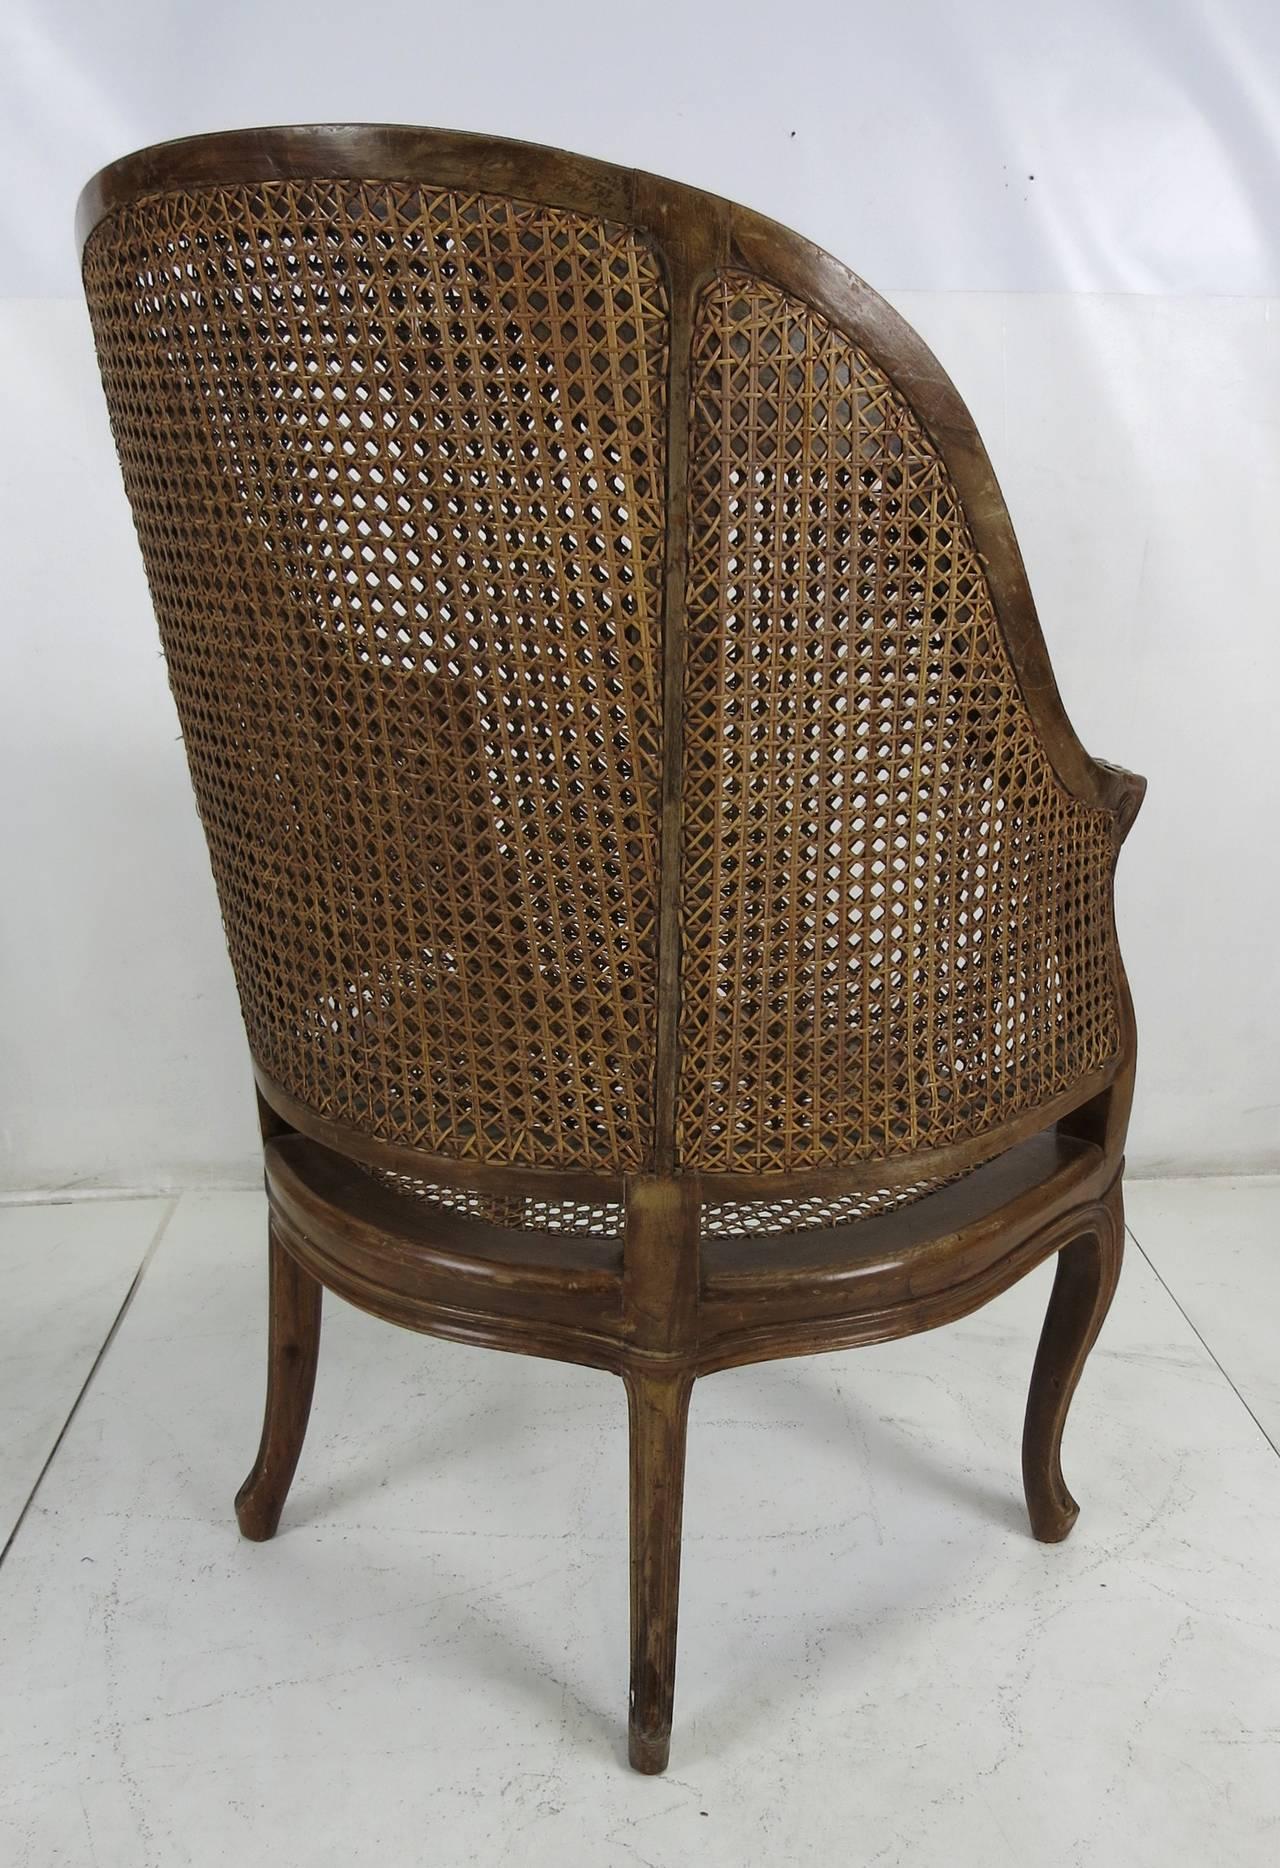 big chairs for sale fishing chair walmart large scale italian louis xv style barrel